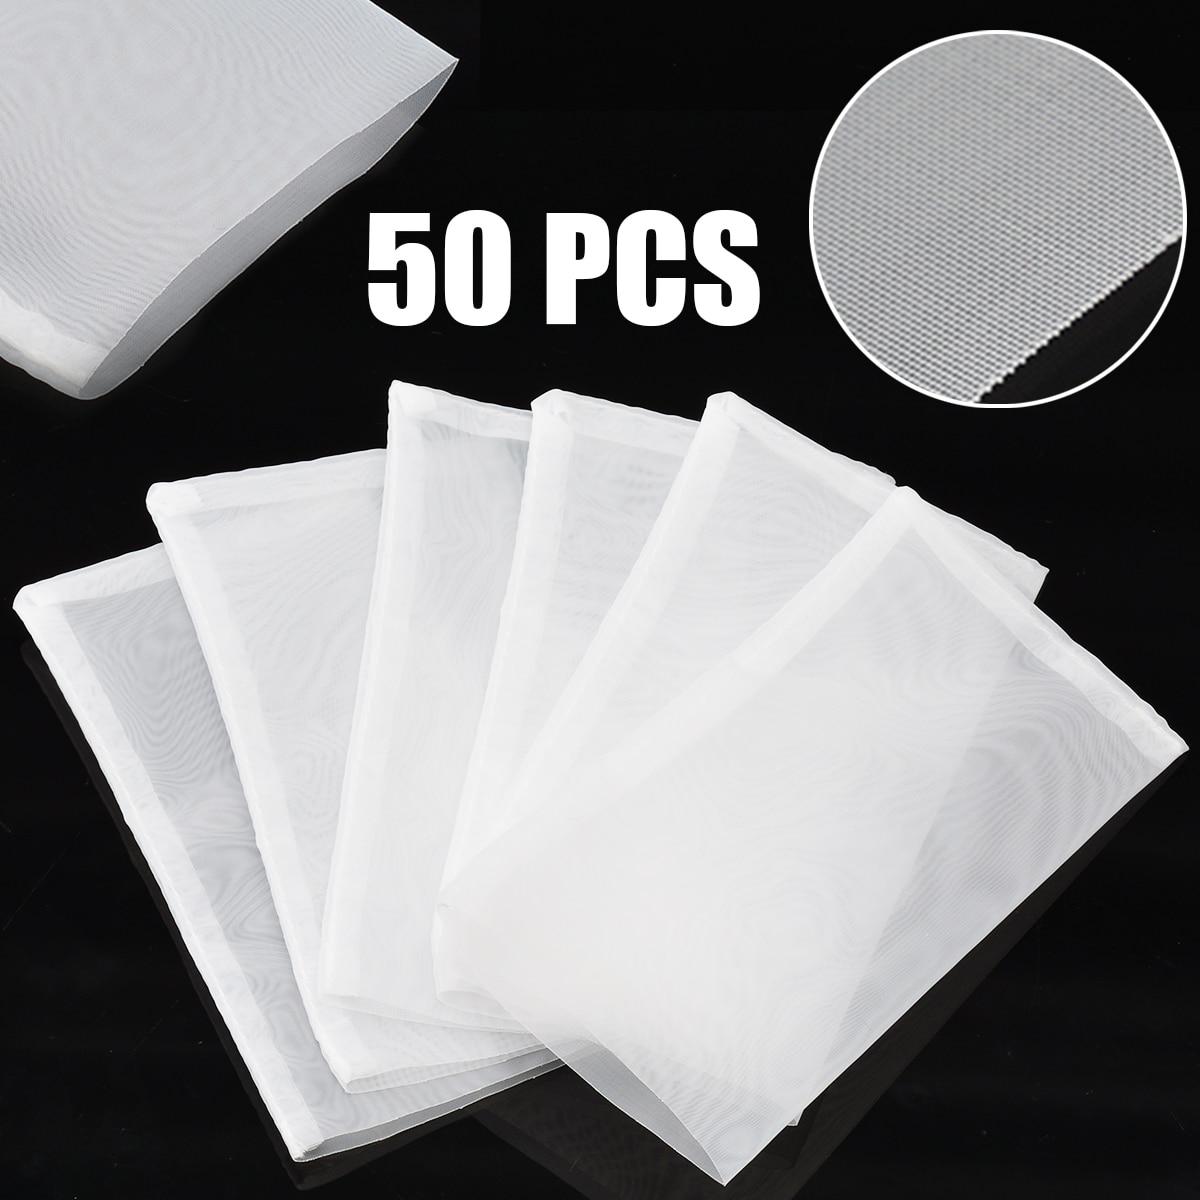 50pcs Reusable 120 Micron Rosin Tech Screen Bags Press Filter Tea Bags 6.2x11.3cm50pcs Reusable 120 Micron Rosin Tech Screen Bags Press Filter Tea Bags 6.2x11.3cm